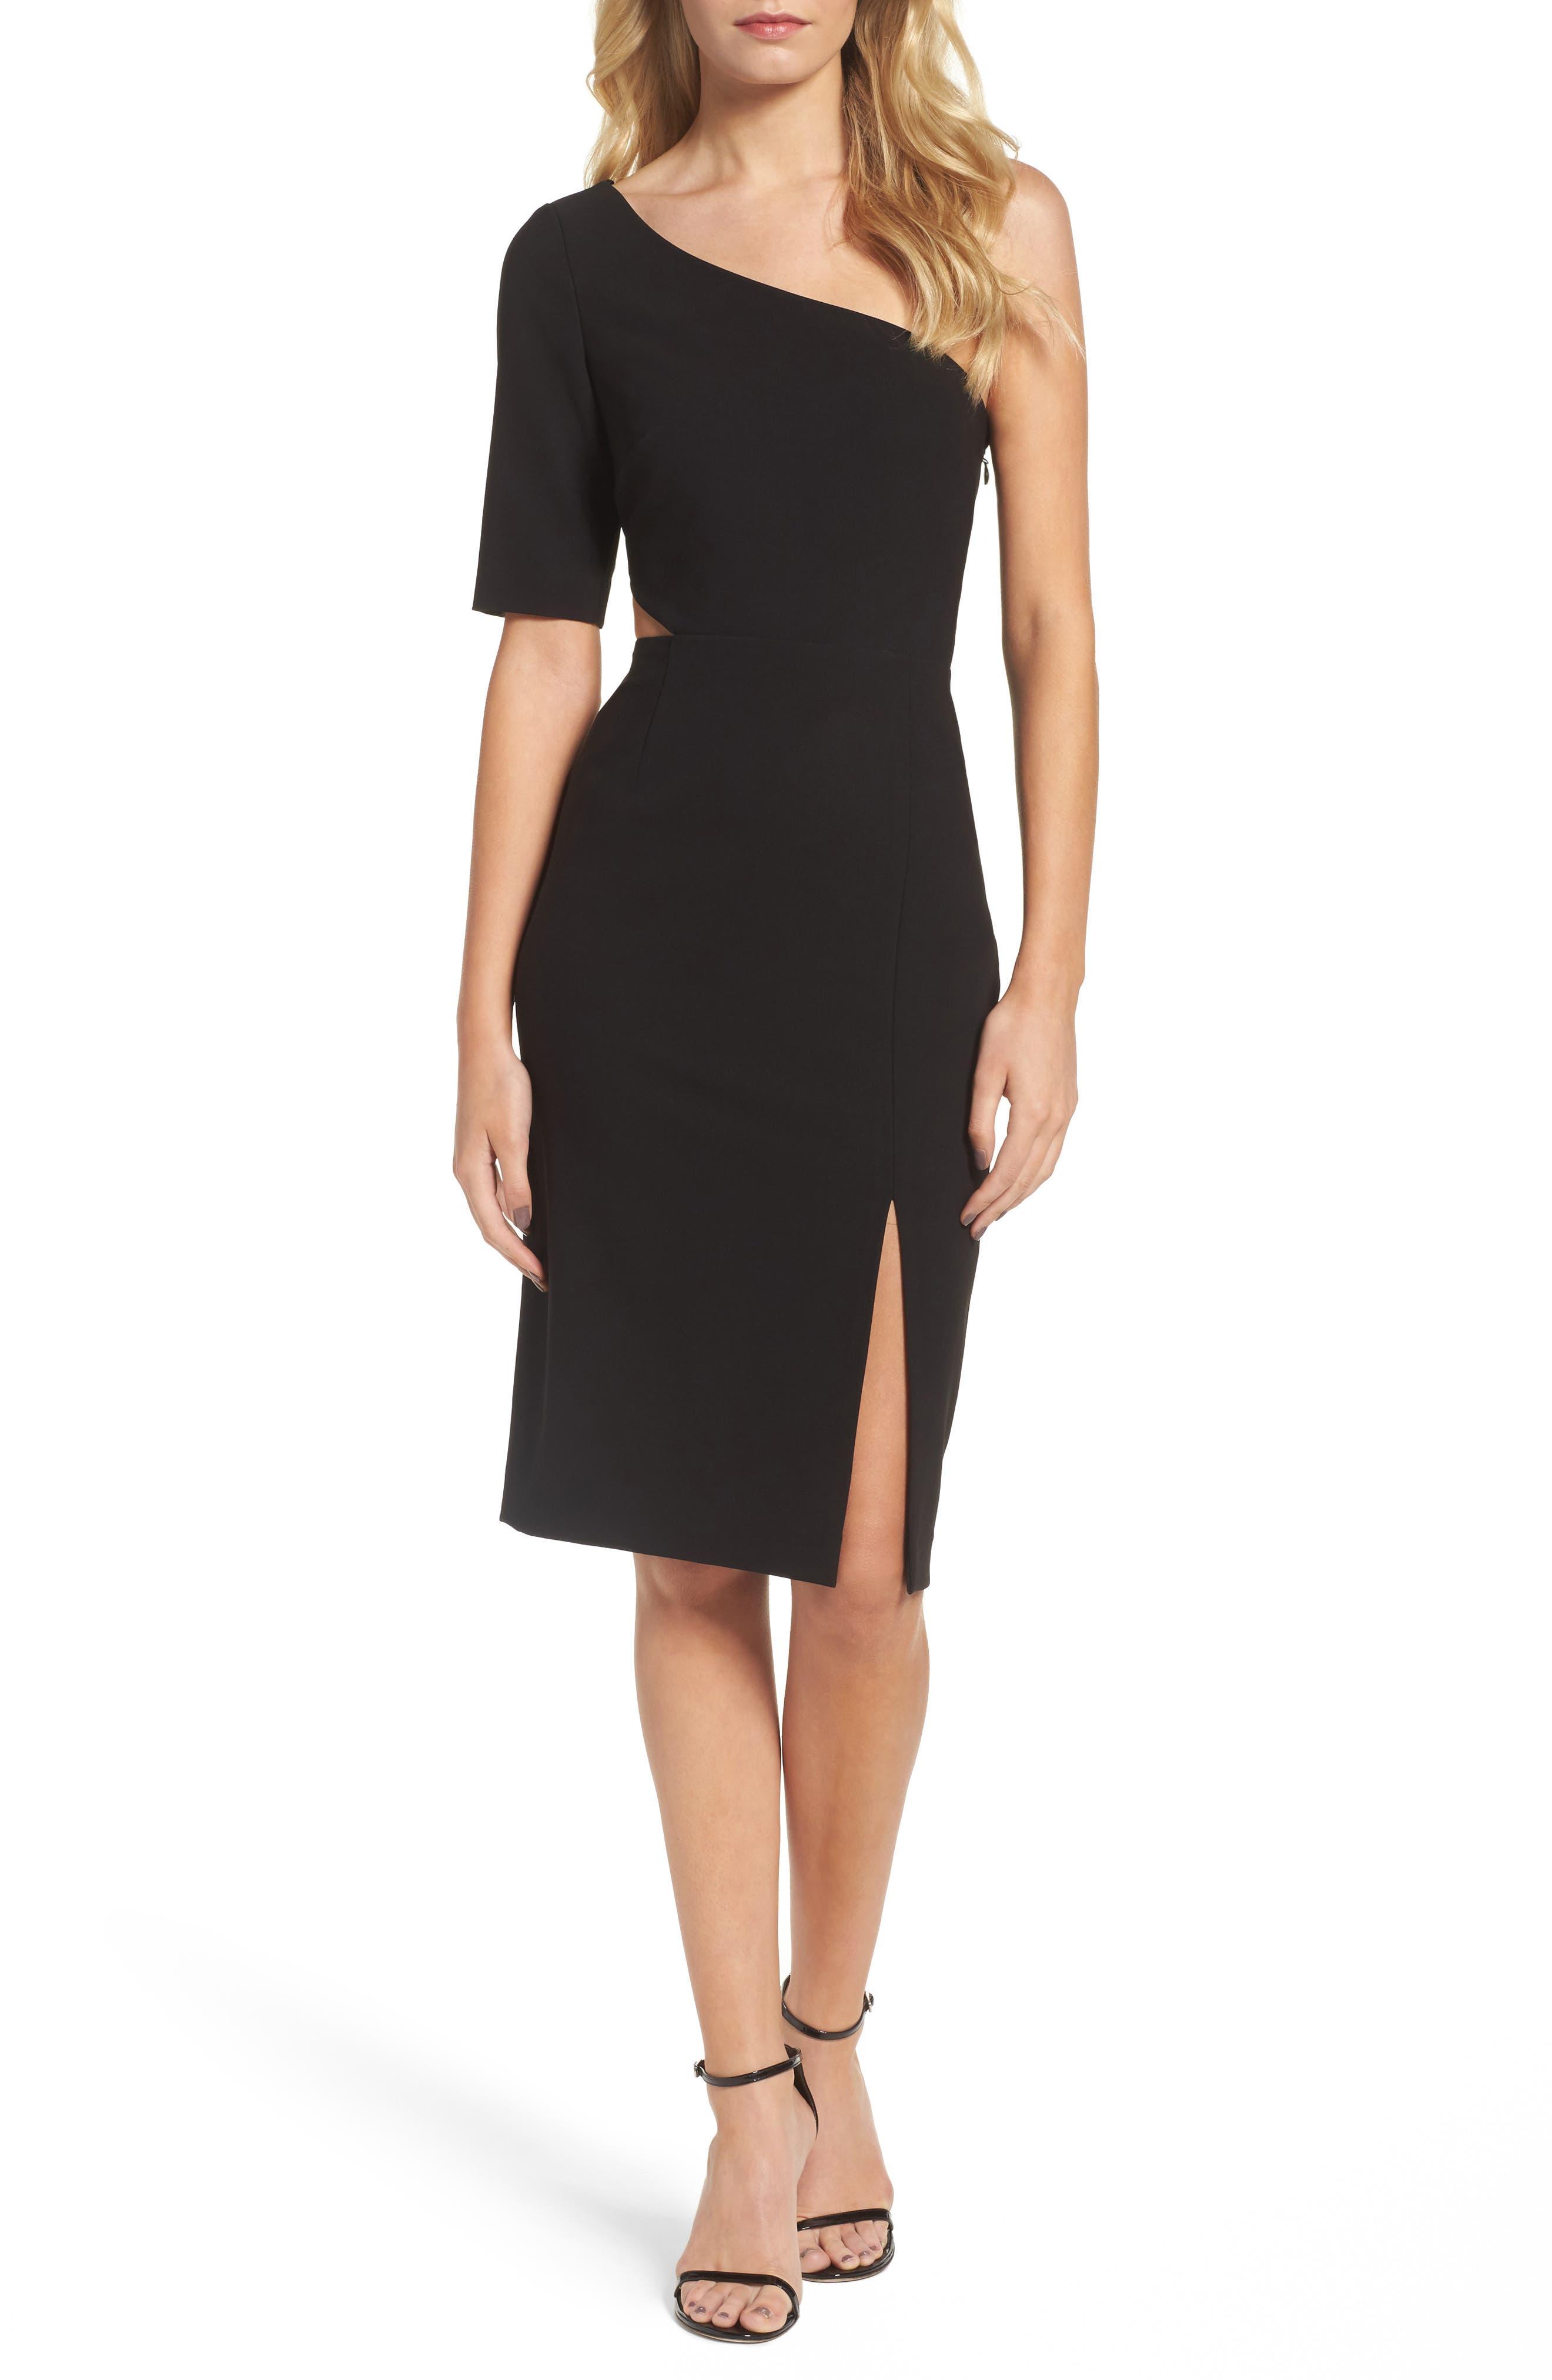 Jill Jill Stuart One-Shoulder Sheath Dress